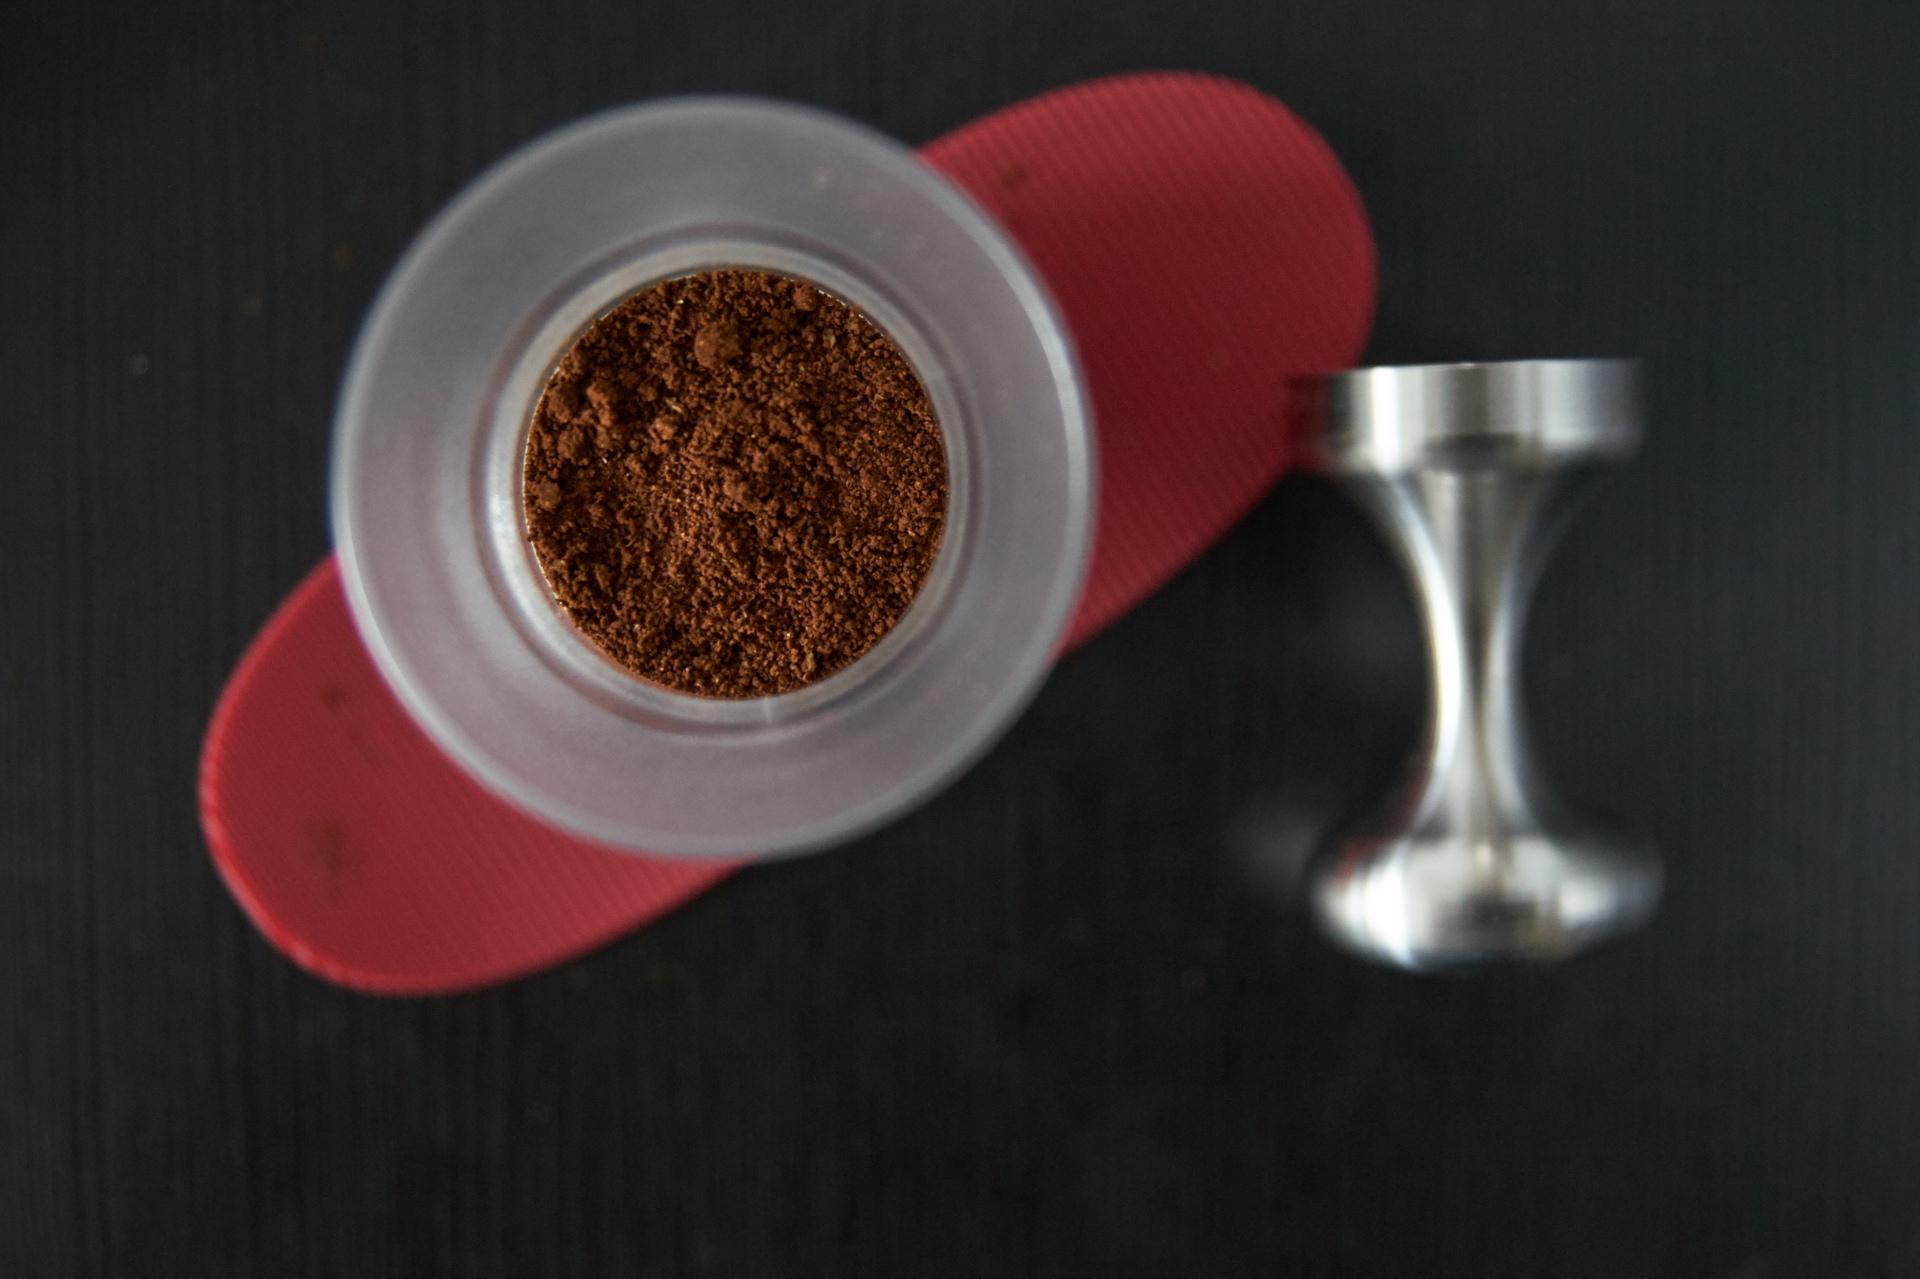 flair espresso tamper